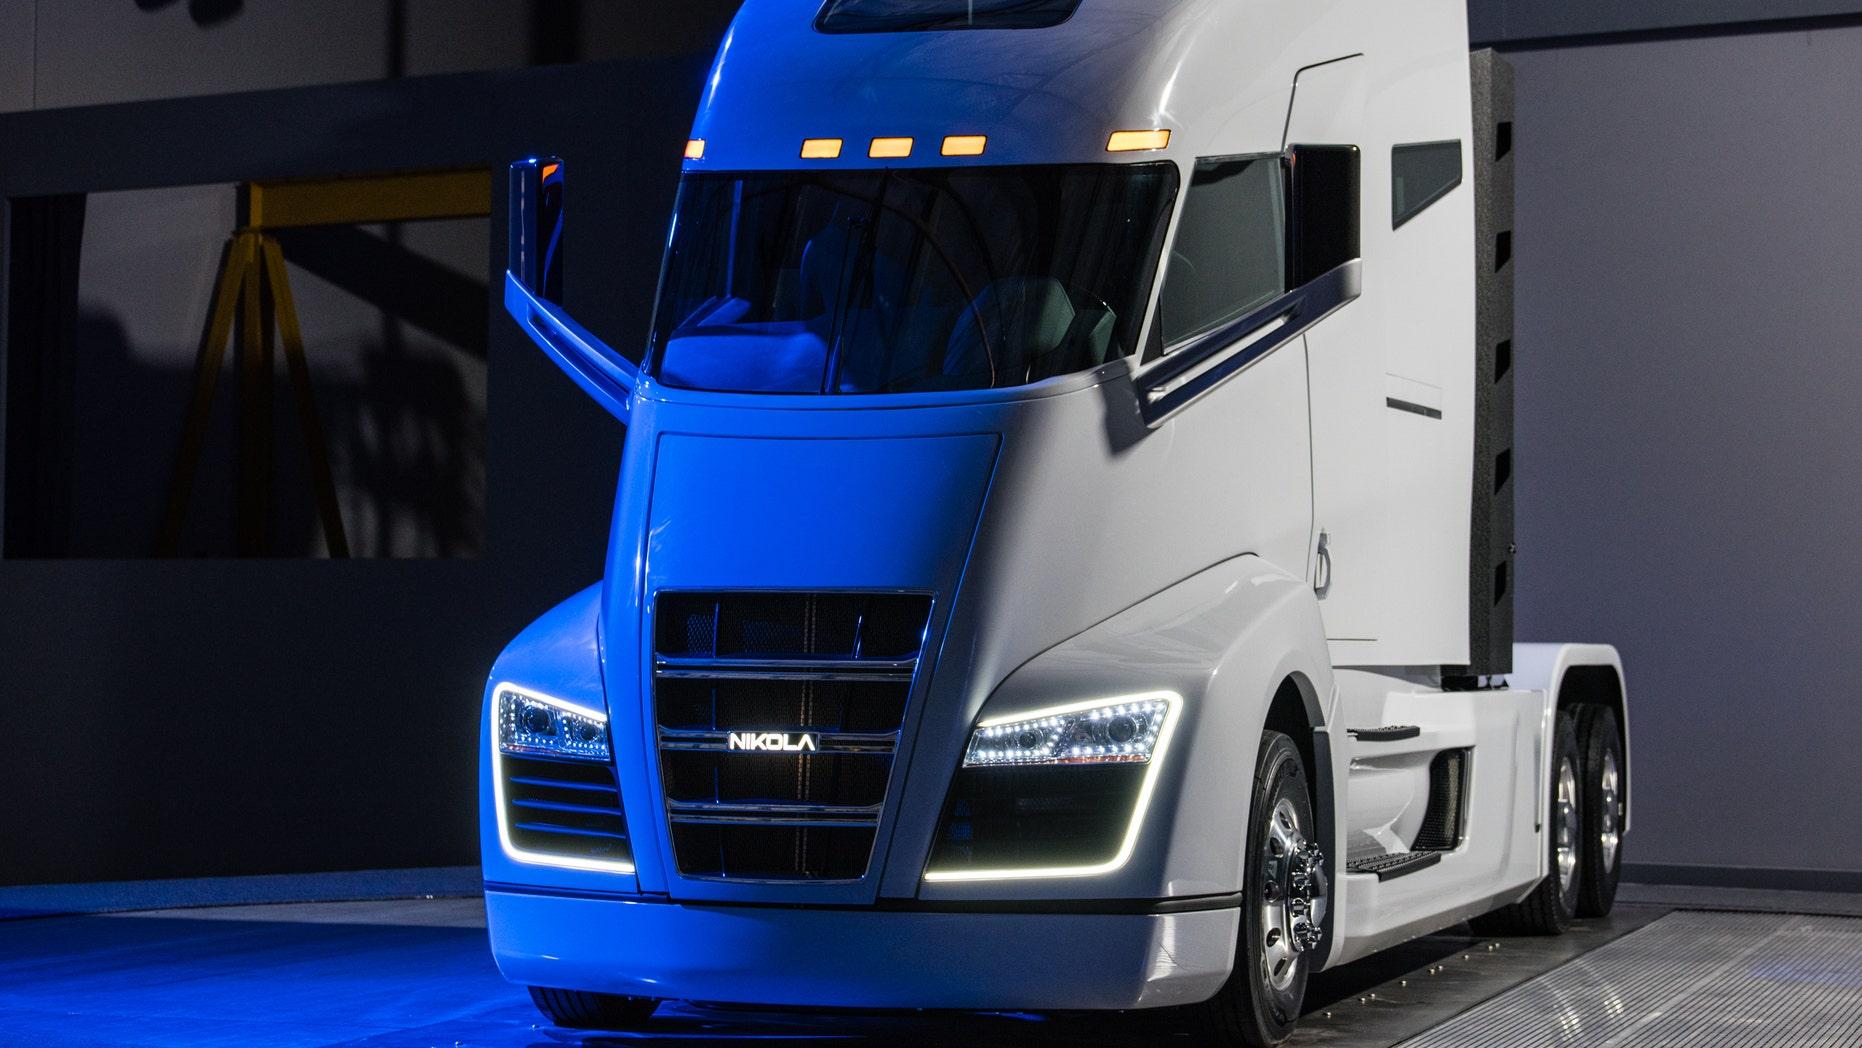 Nikola Hydrogen Ed Semi Truck Revealed